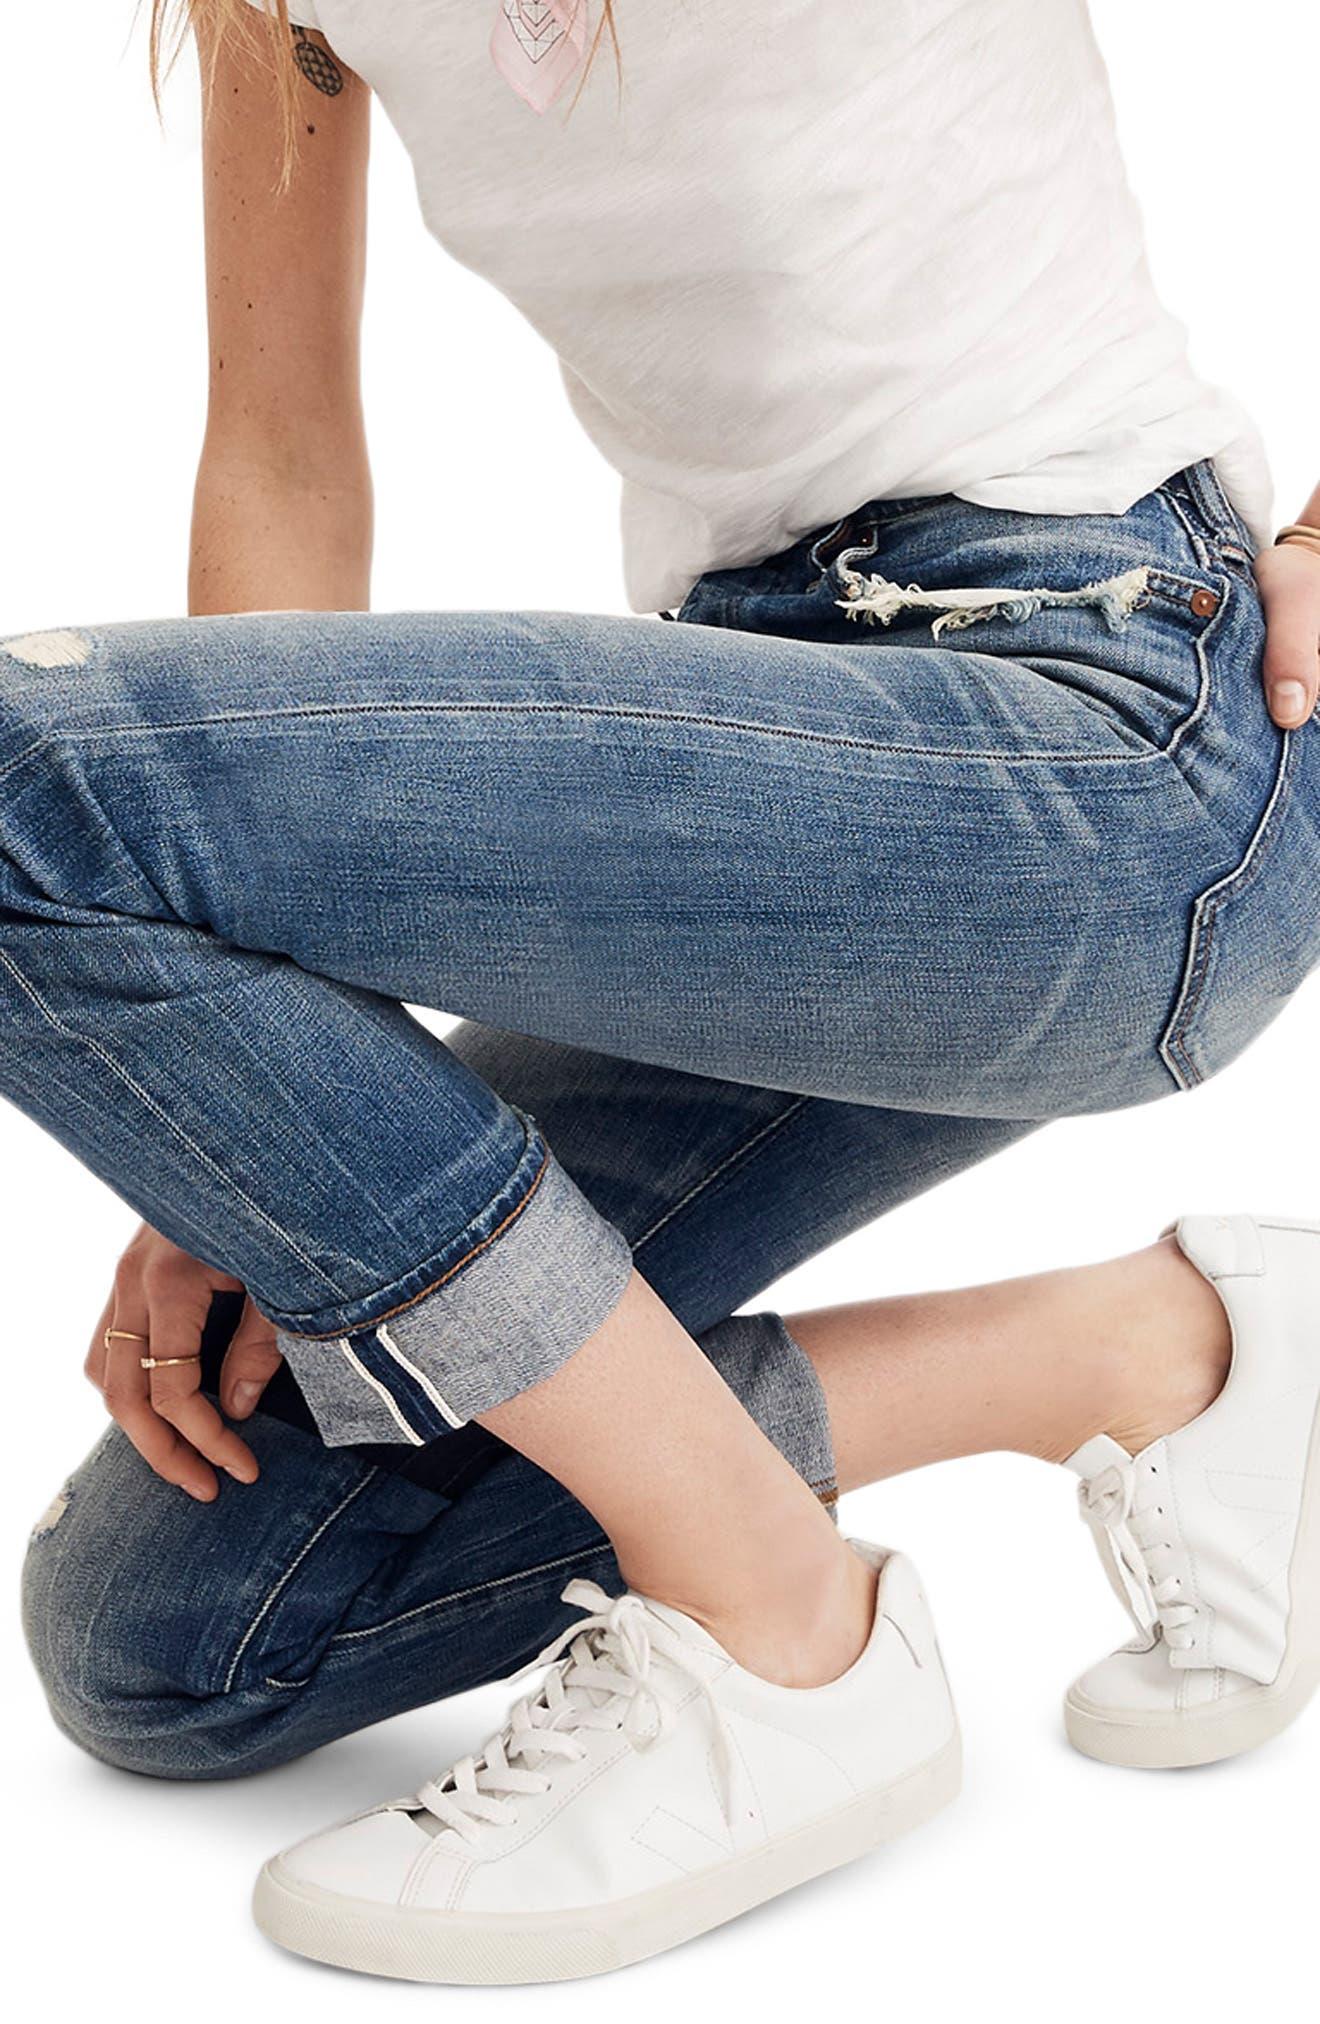 MADEWELL, Selvedge Distressed Straight Leg Jeans, Alternate thumbnail 4, color, CLOVERDALE